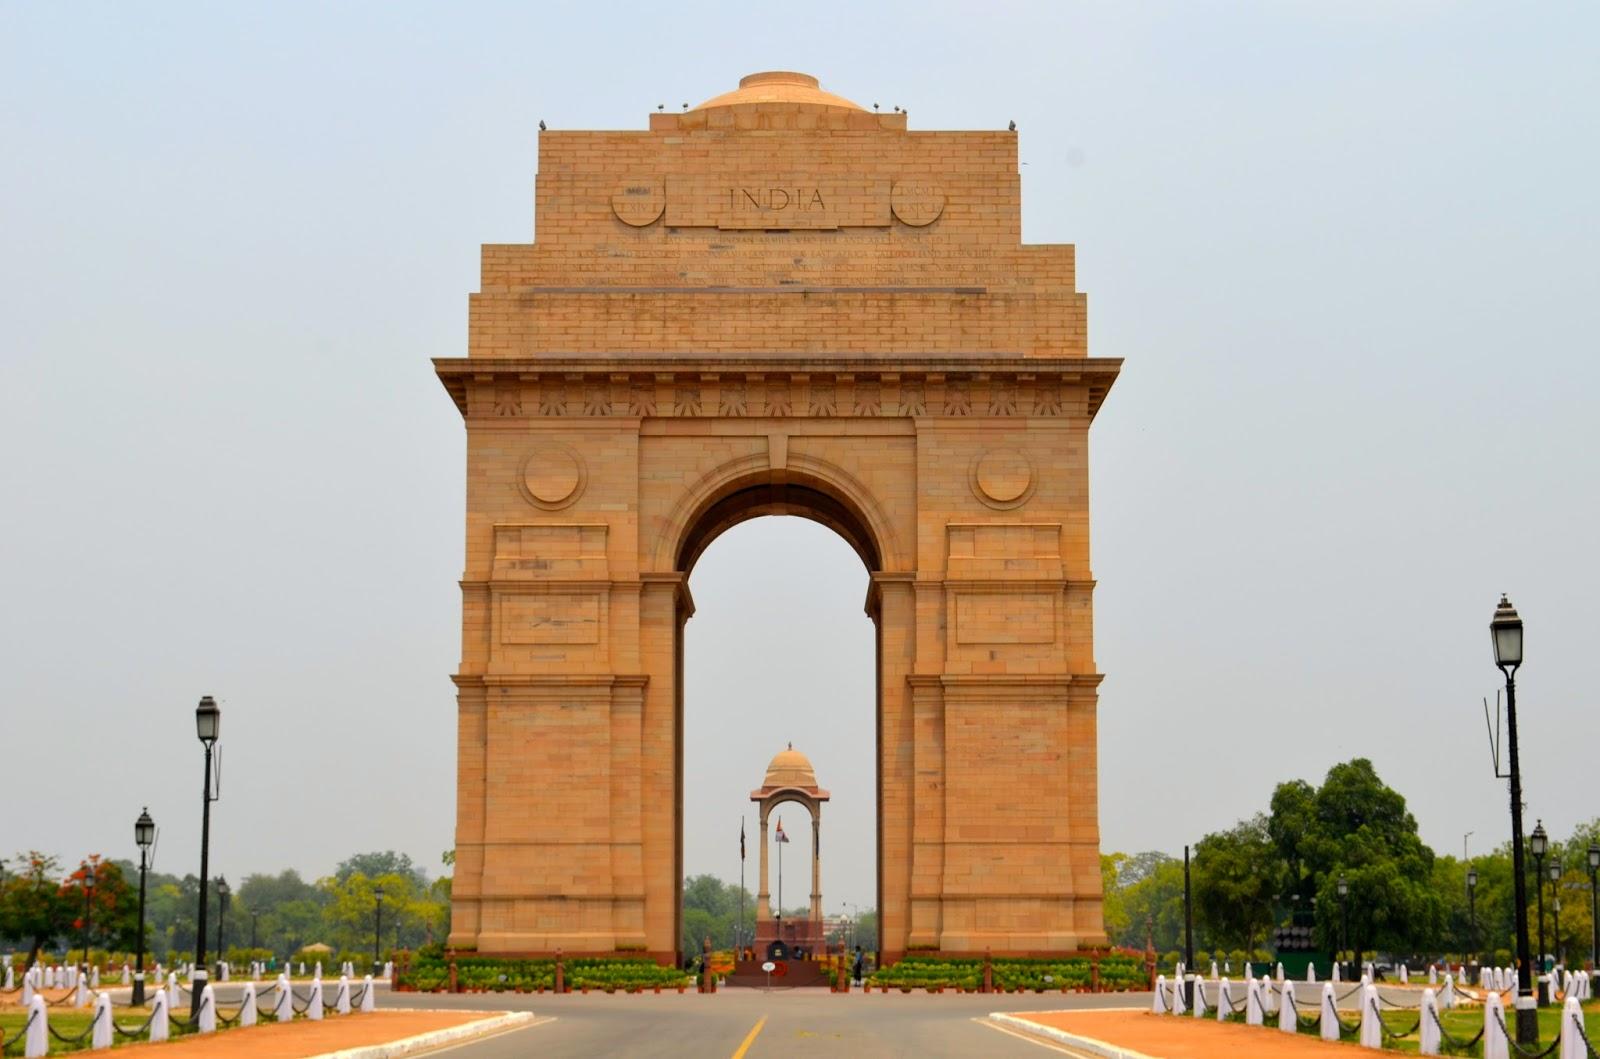 India Gate Delhi,India